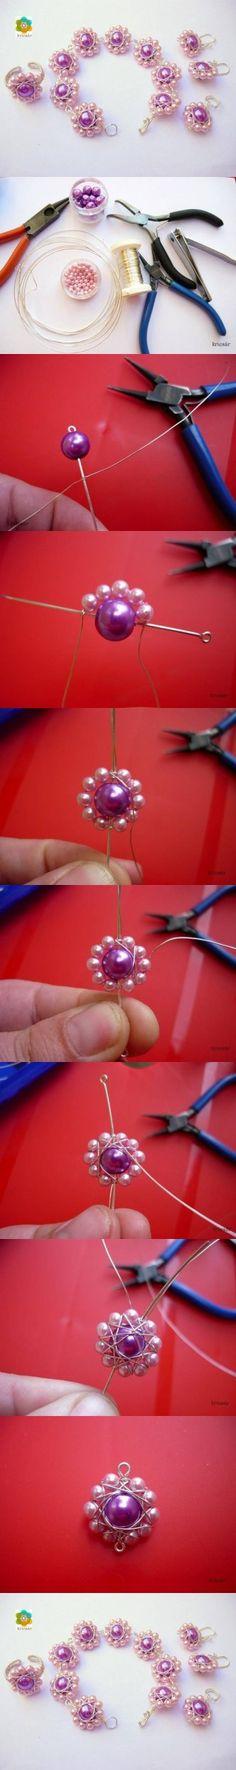 DIY Bead Flower Internet Tutorial DIY Projects